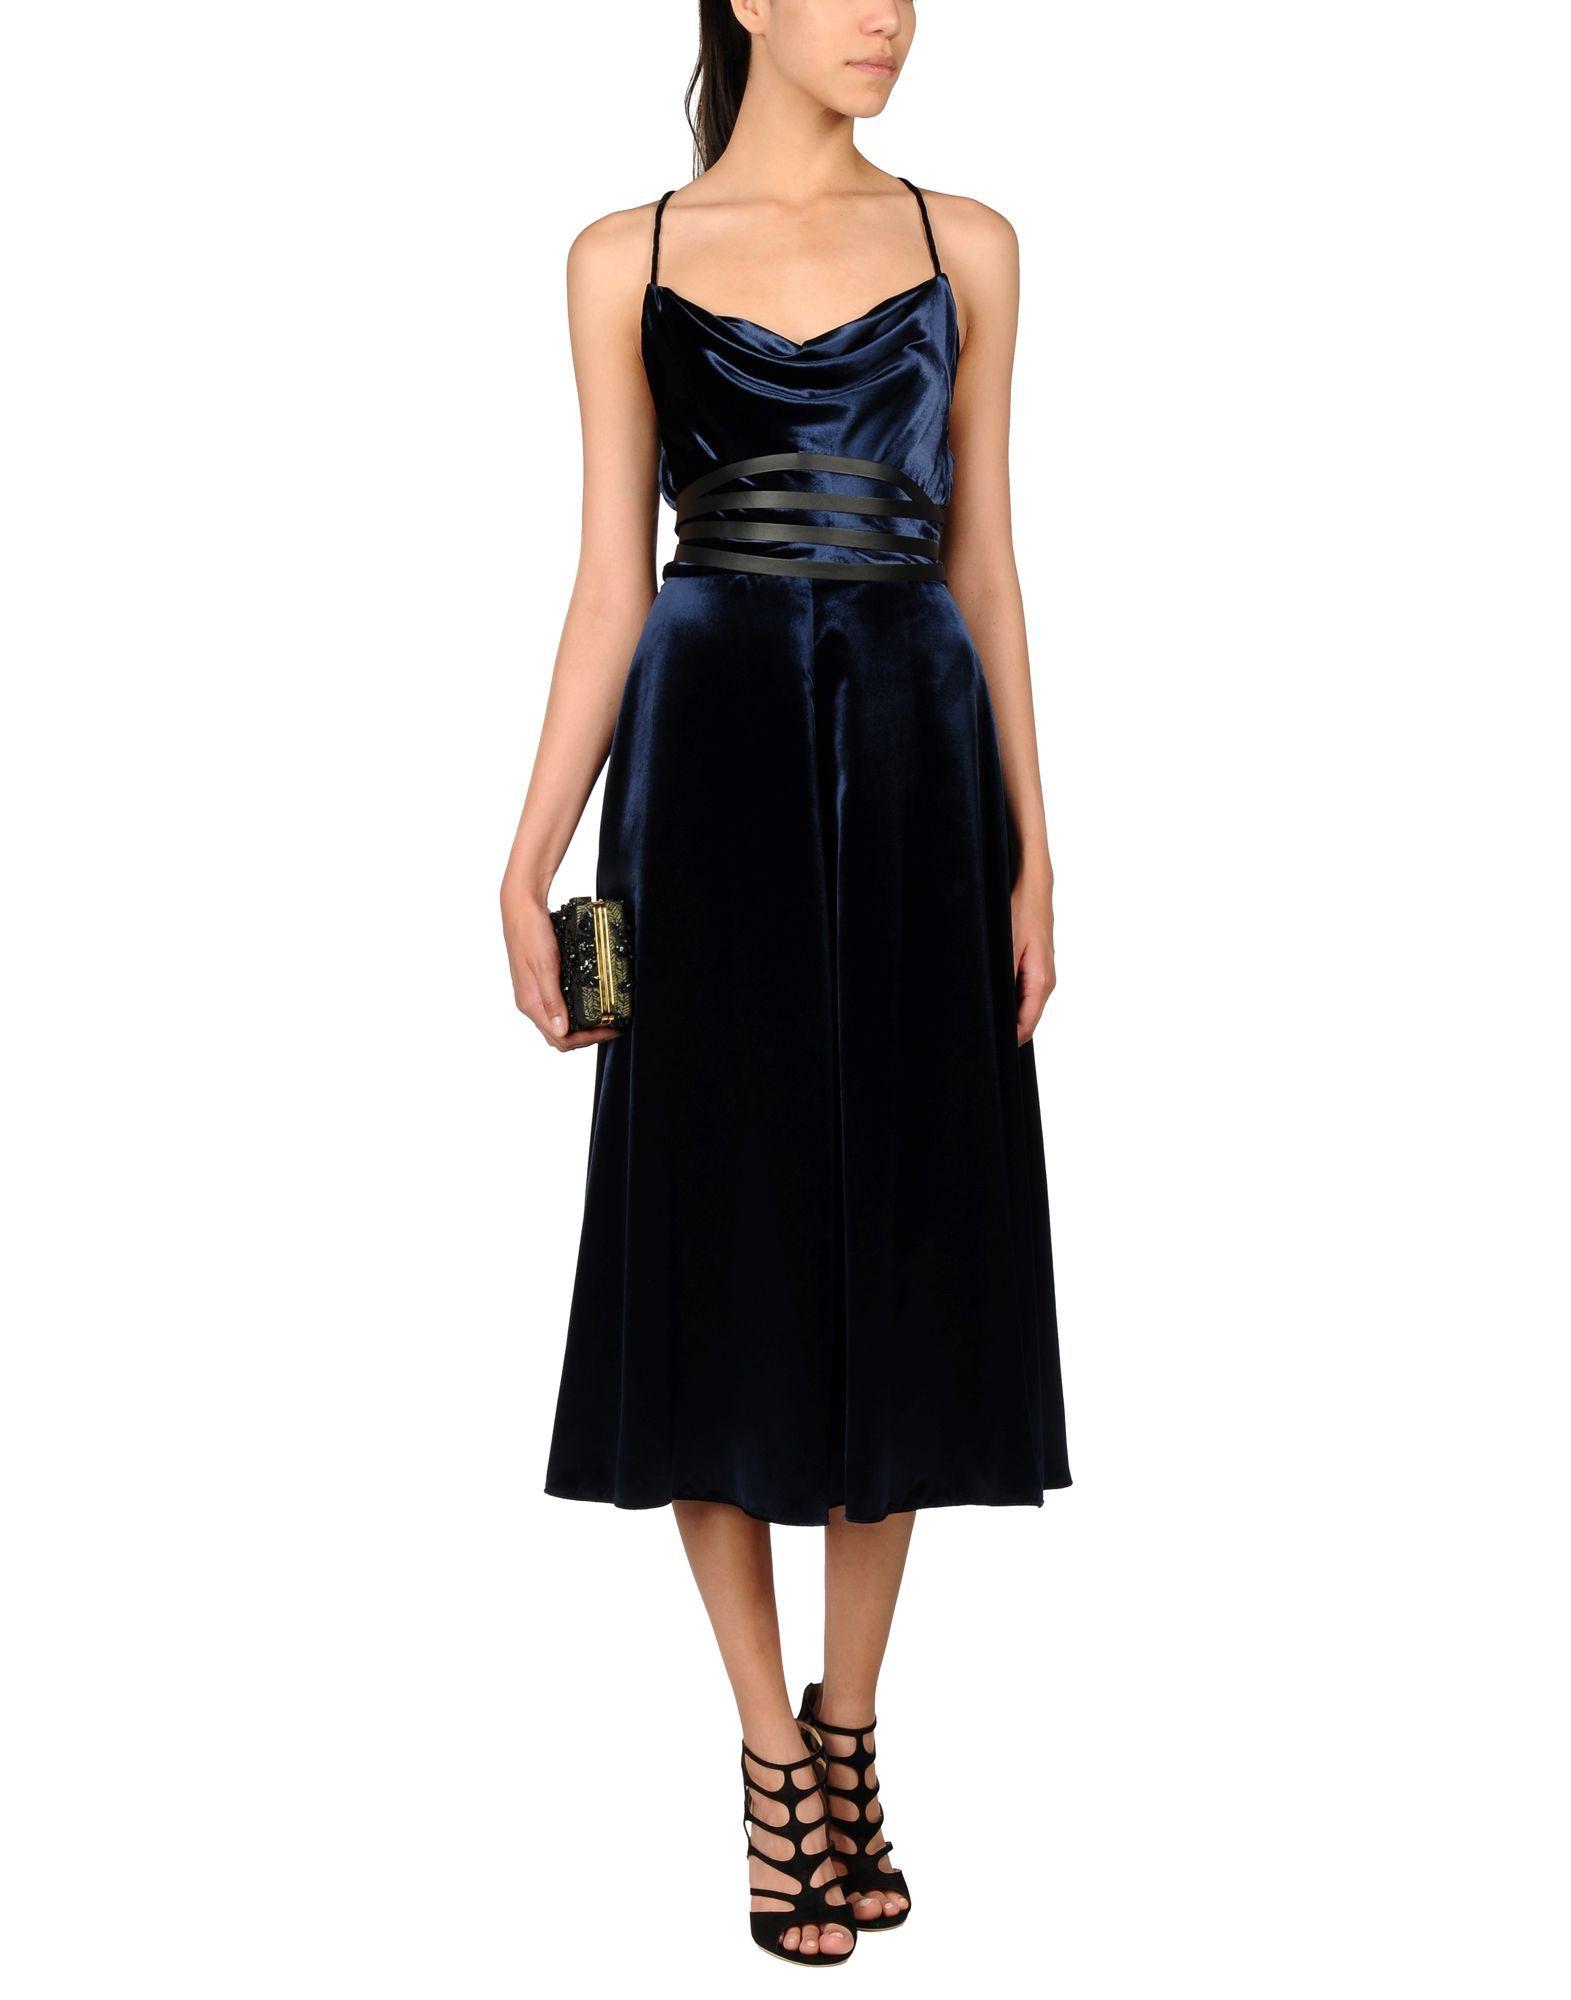 c8880d550b27 Φόρεμα Μήκους 3 4 Valentino Γυναίκα - Φορέματα Μήκους 3 4 Valentino στο YOOX